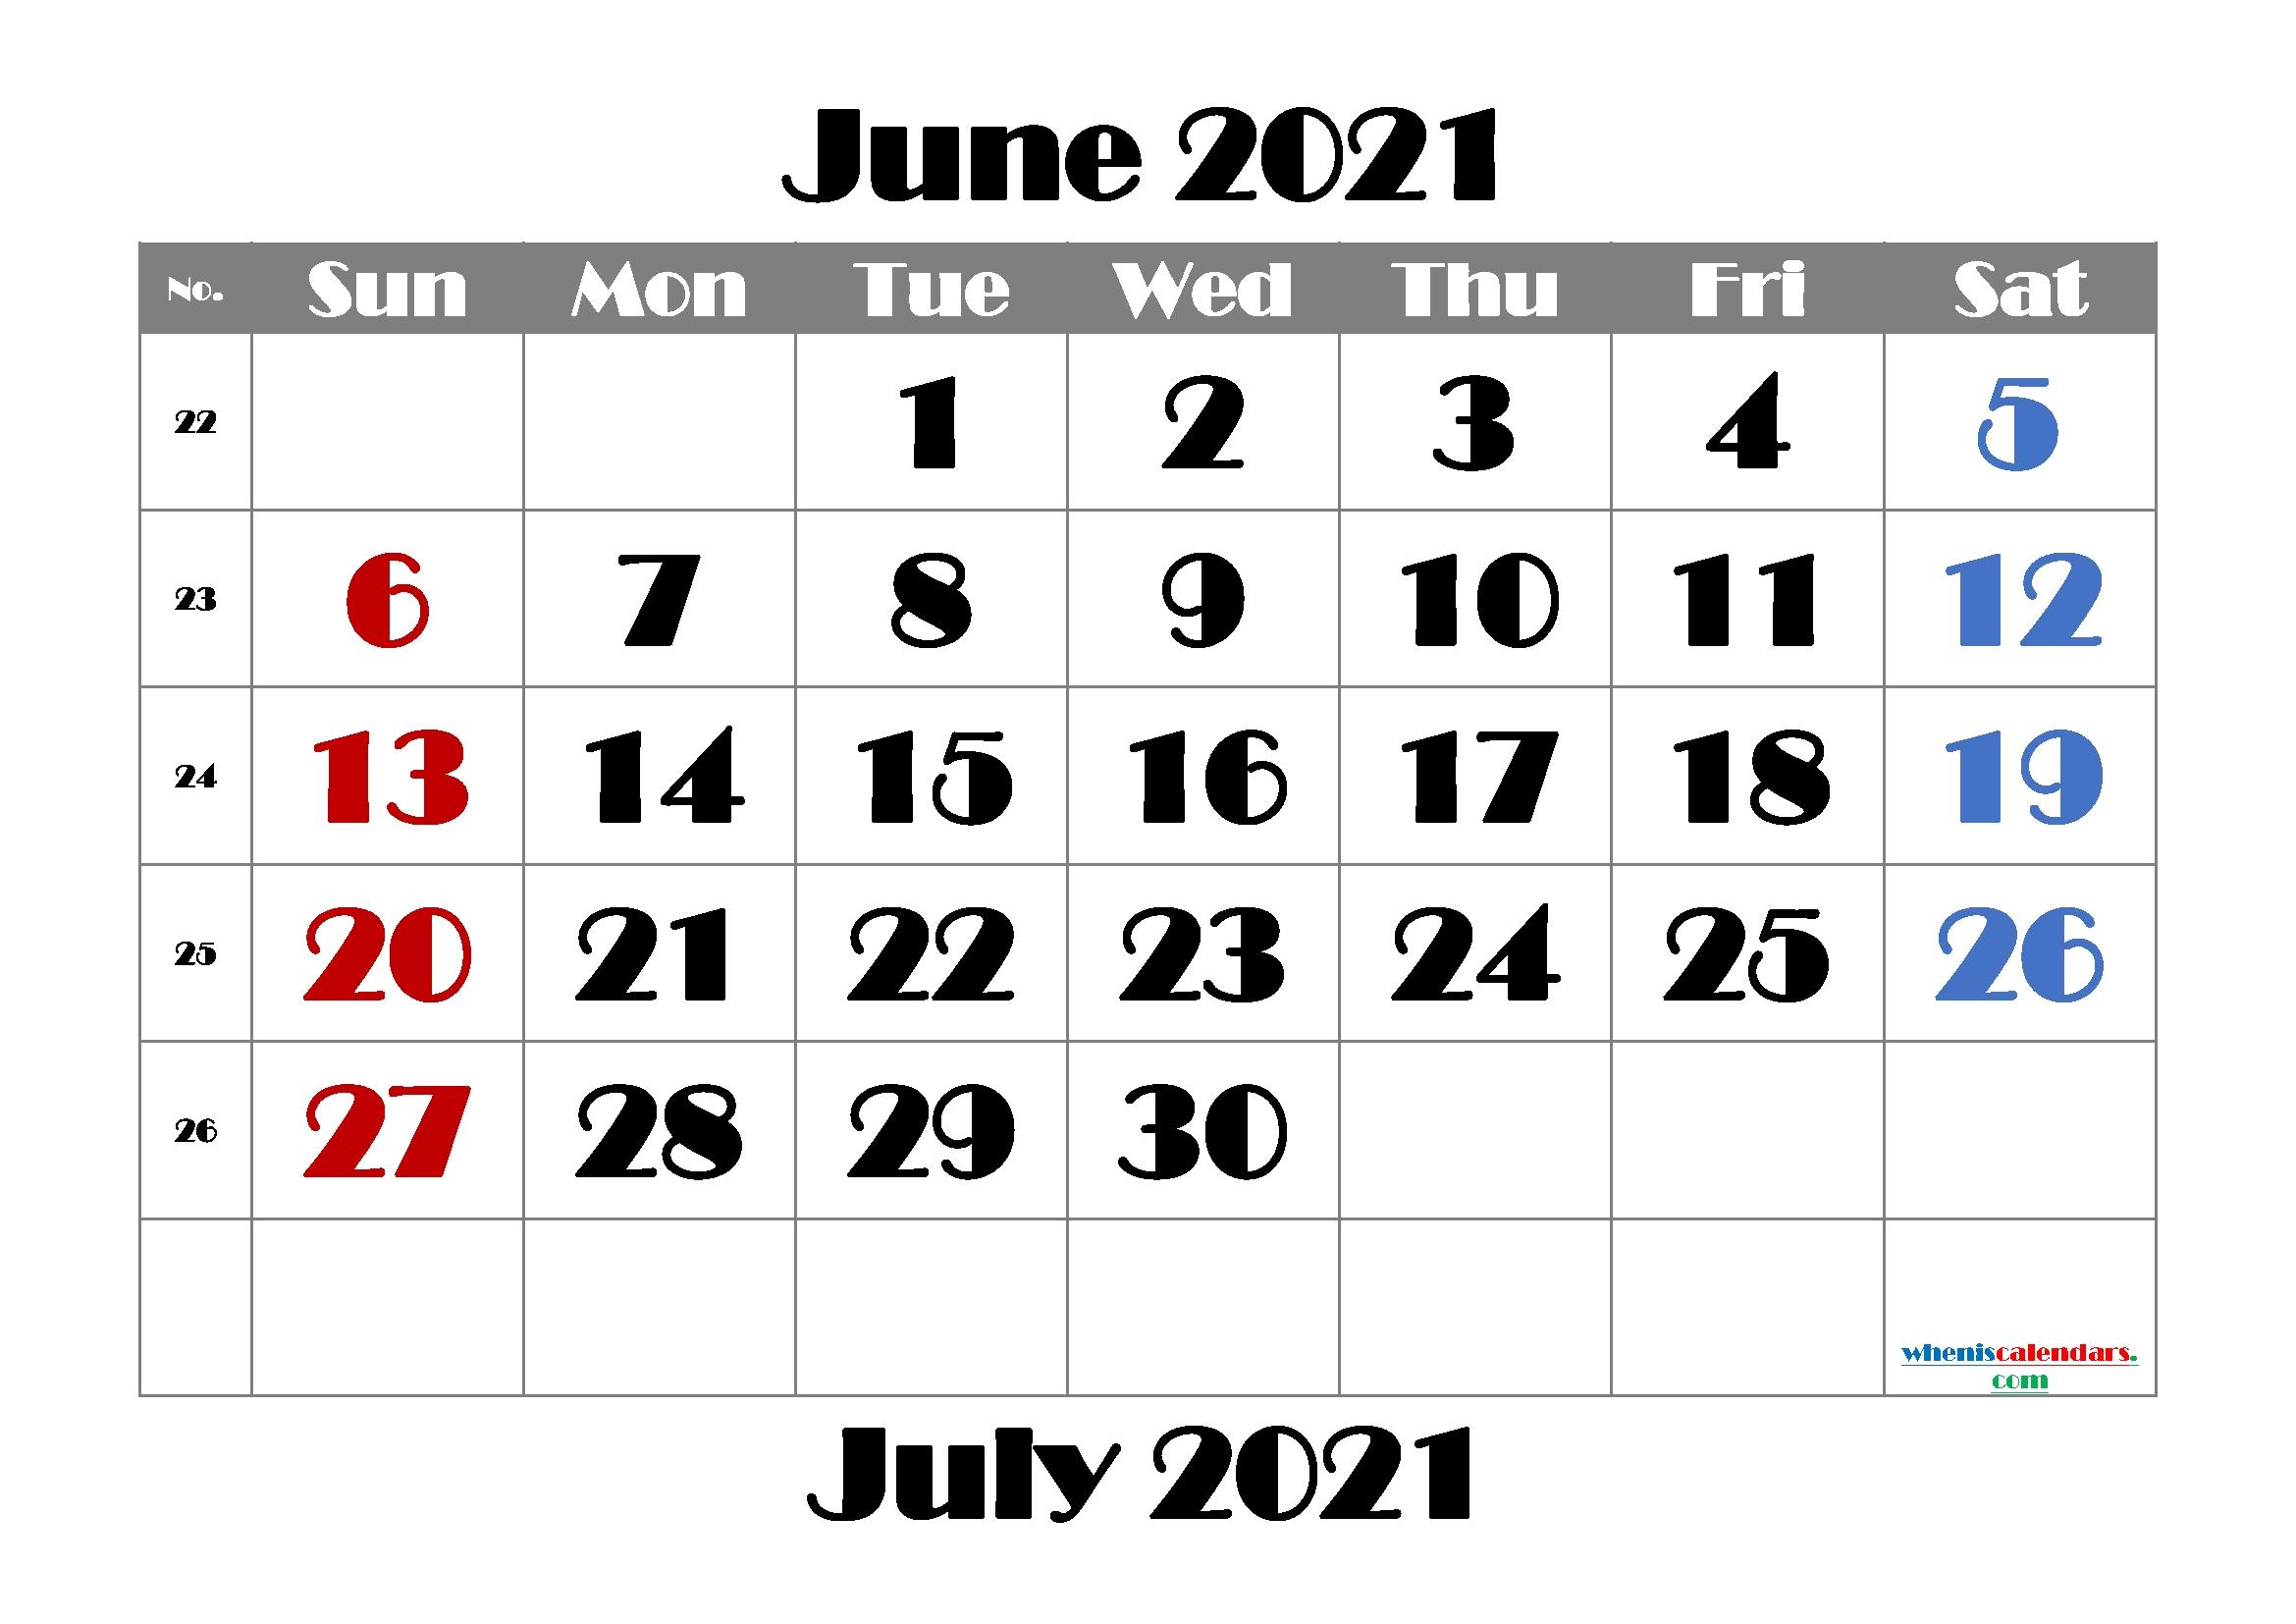 Collect June 2021 To June 2021 Calendar